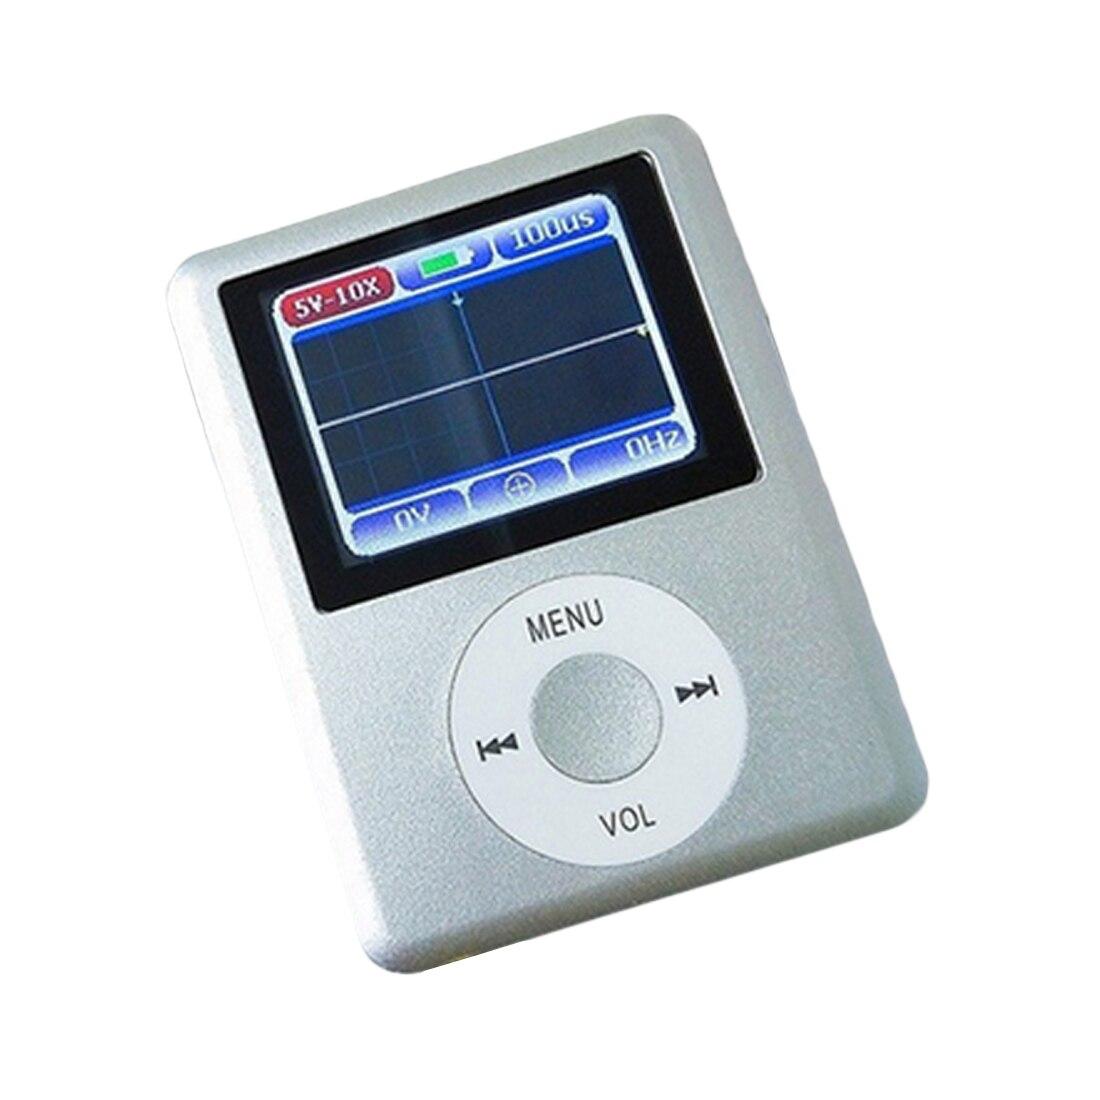 20M Bandwidth 100M Sampling Rate Handheld Mini Pocket Portable Ultra-small Digital Oscilloscope DSO168 20M Bandwidth 100M Sampling Rate Handheld Mini Pocket Portable Ultra-small Digital Oscilloscope DSO168